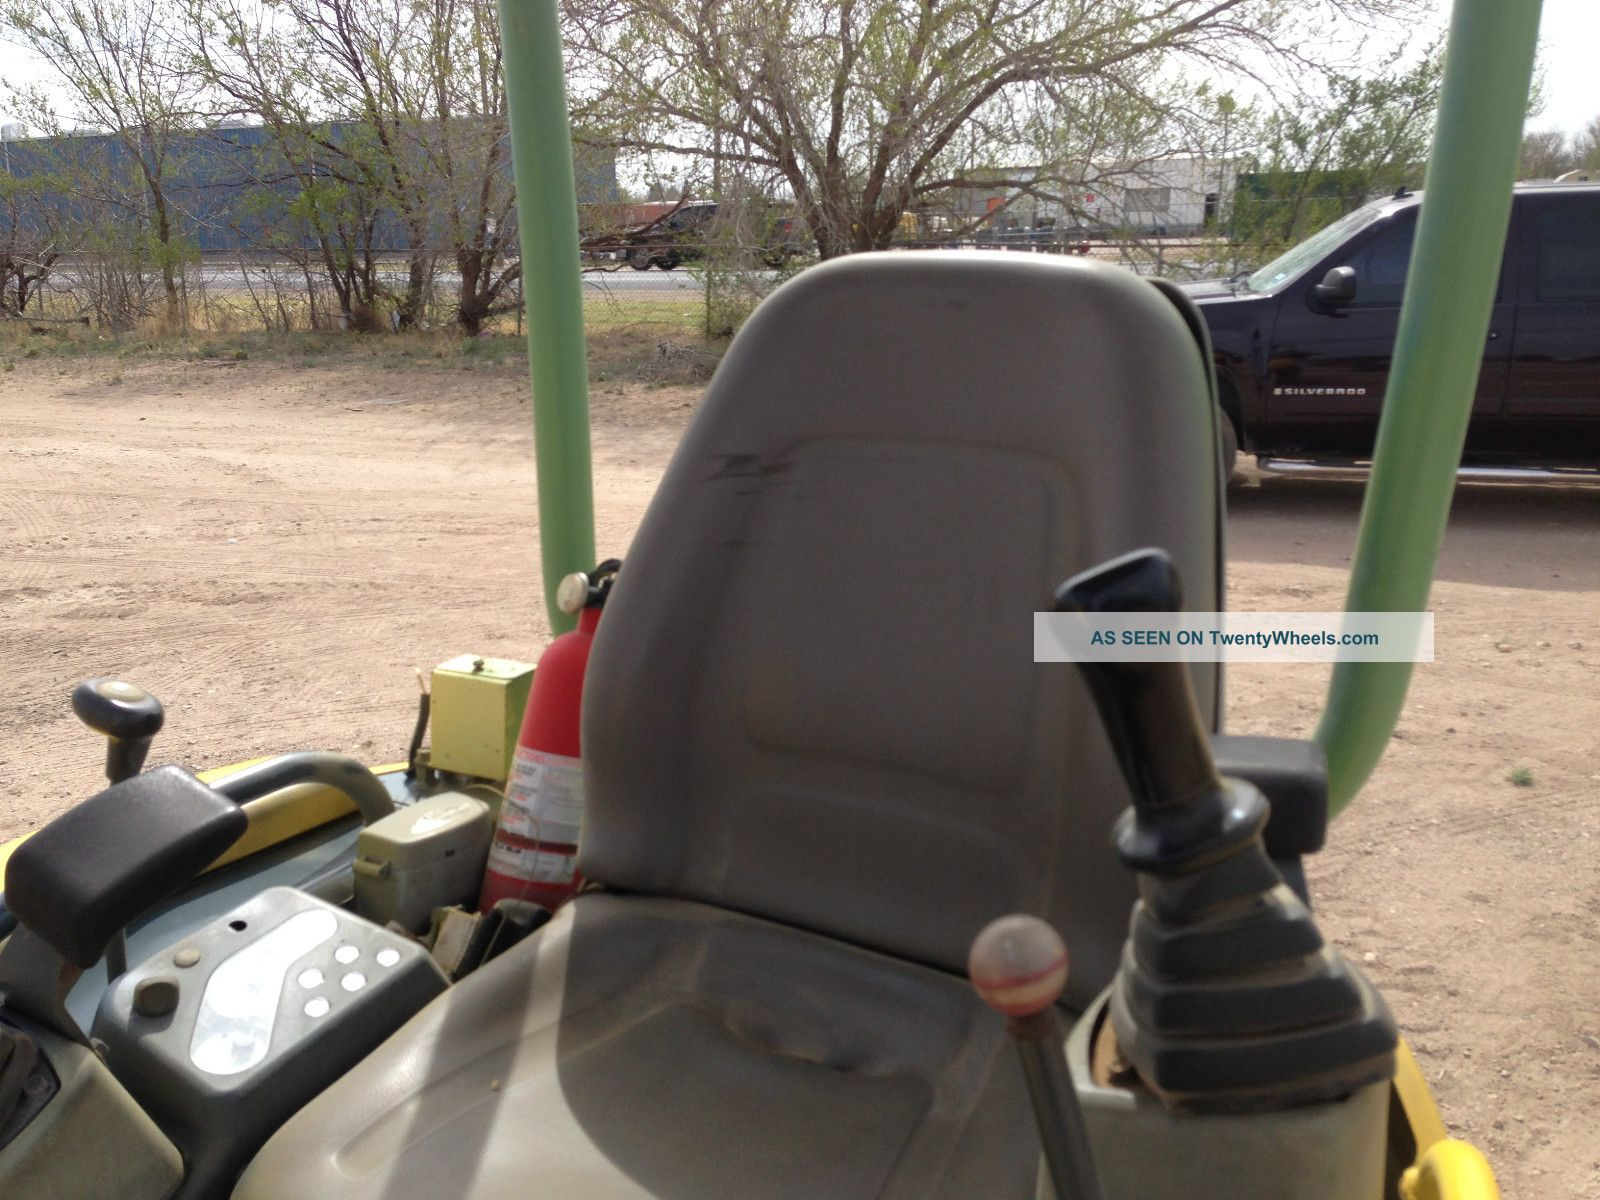 Case 1845c Specs >> Yanmar Vio20 - 3 Rubber Hydraulic Track Excavator Dozer ...